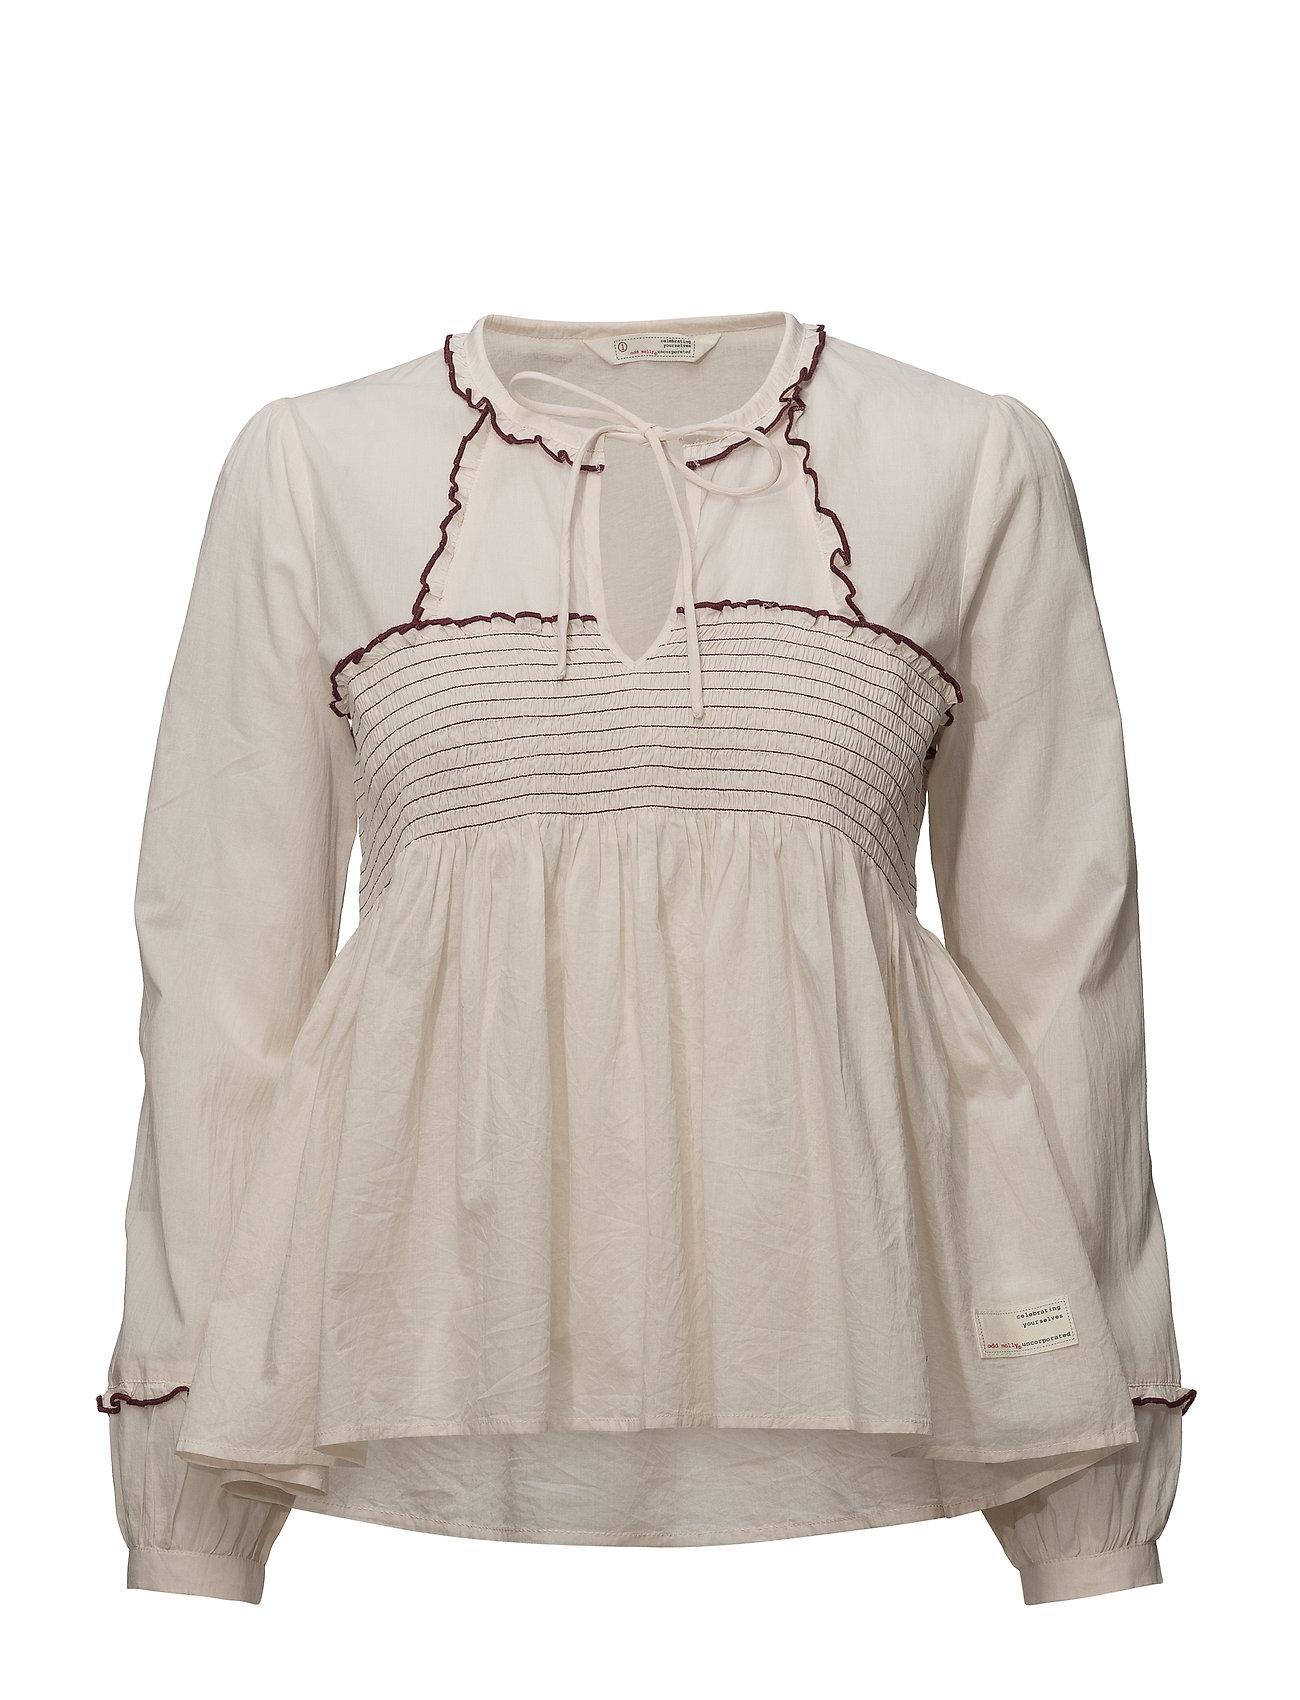 ODD MOLLY ripple crush blouse - SHEER PINK